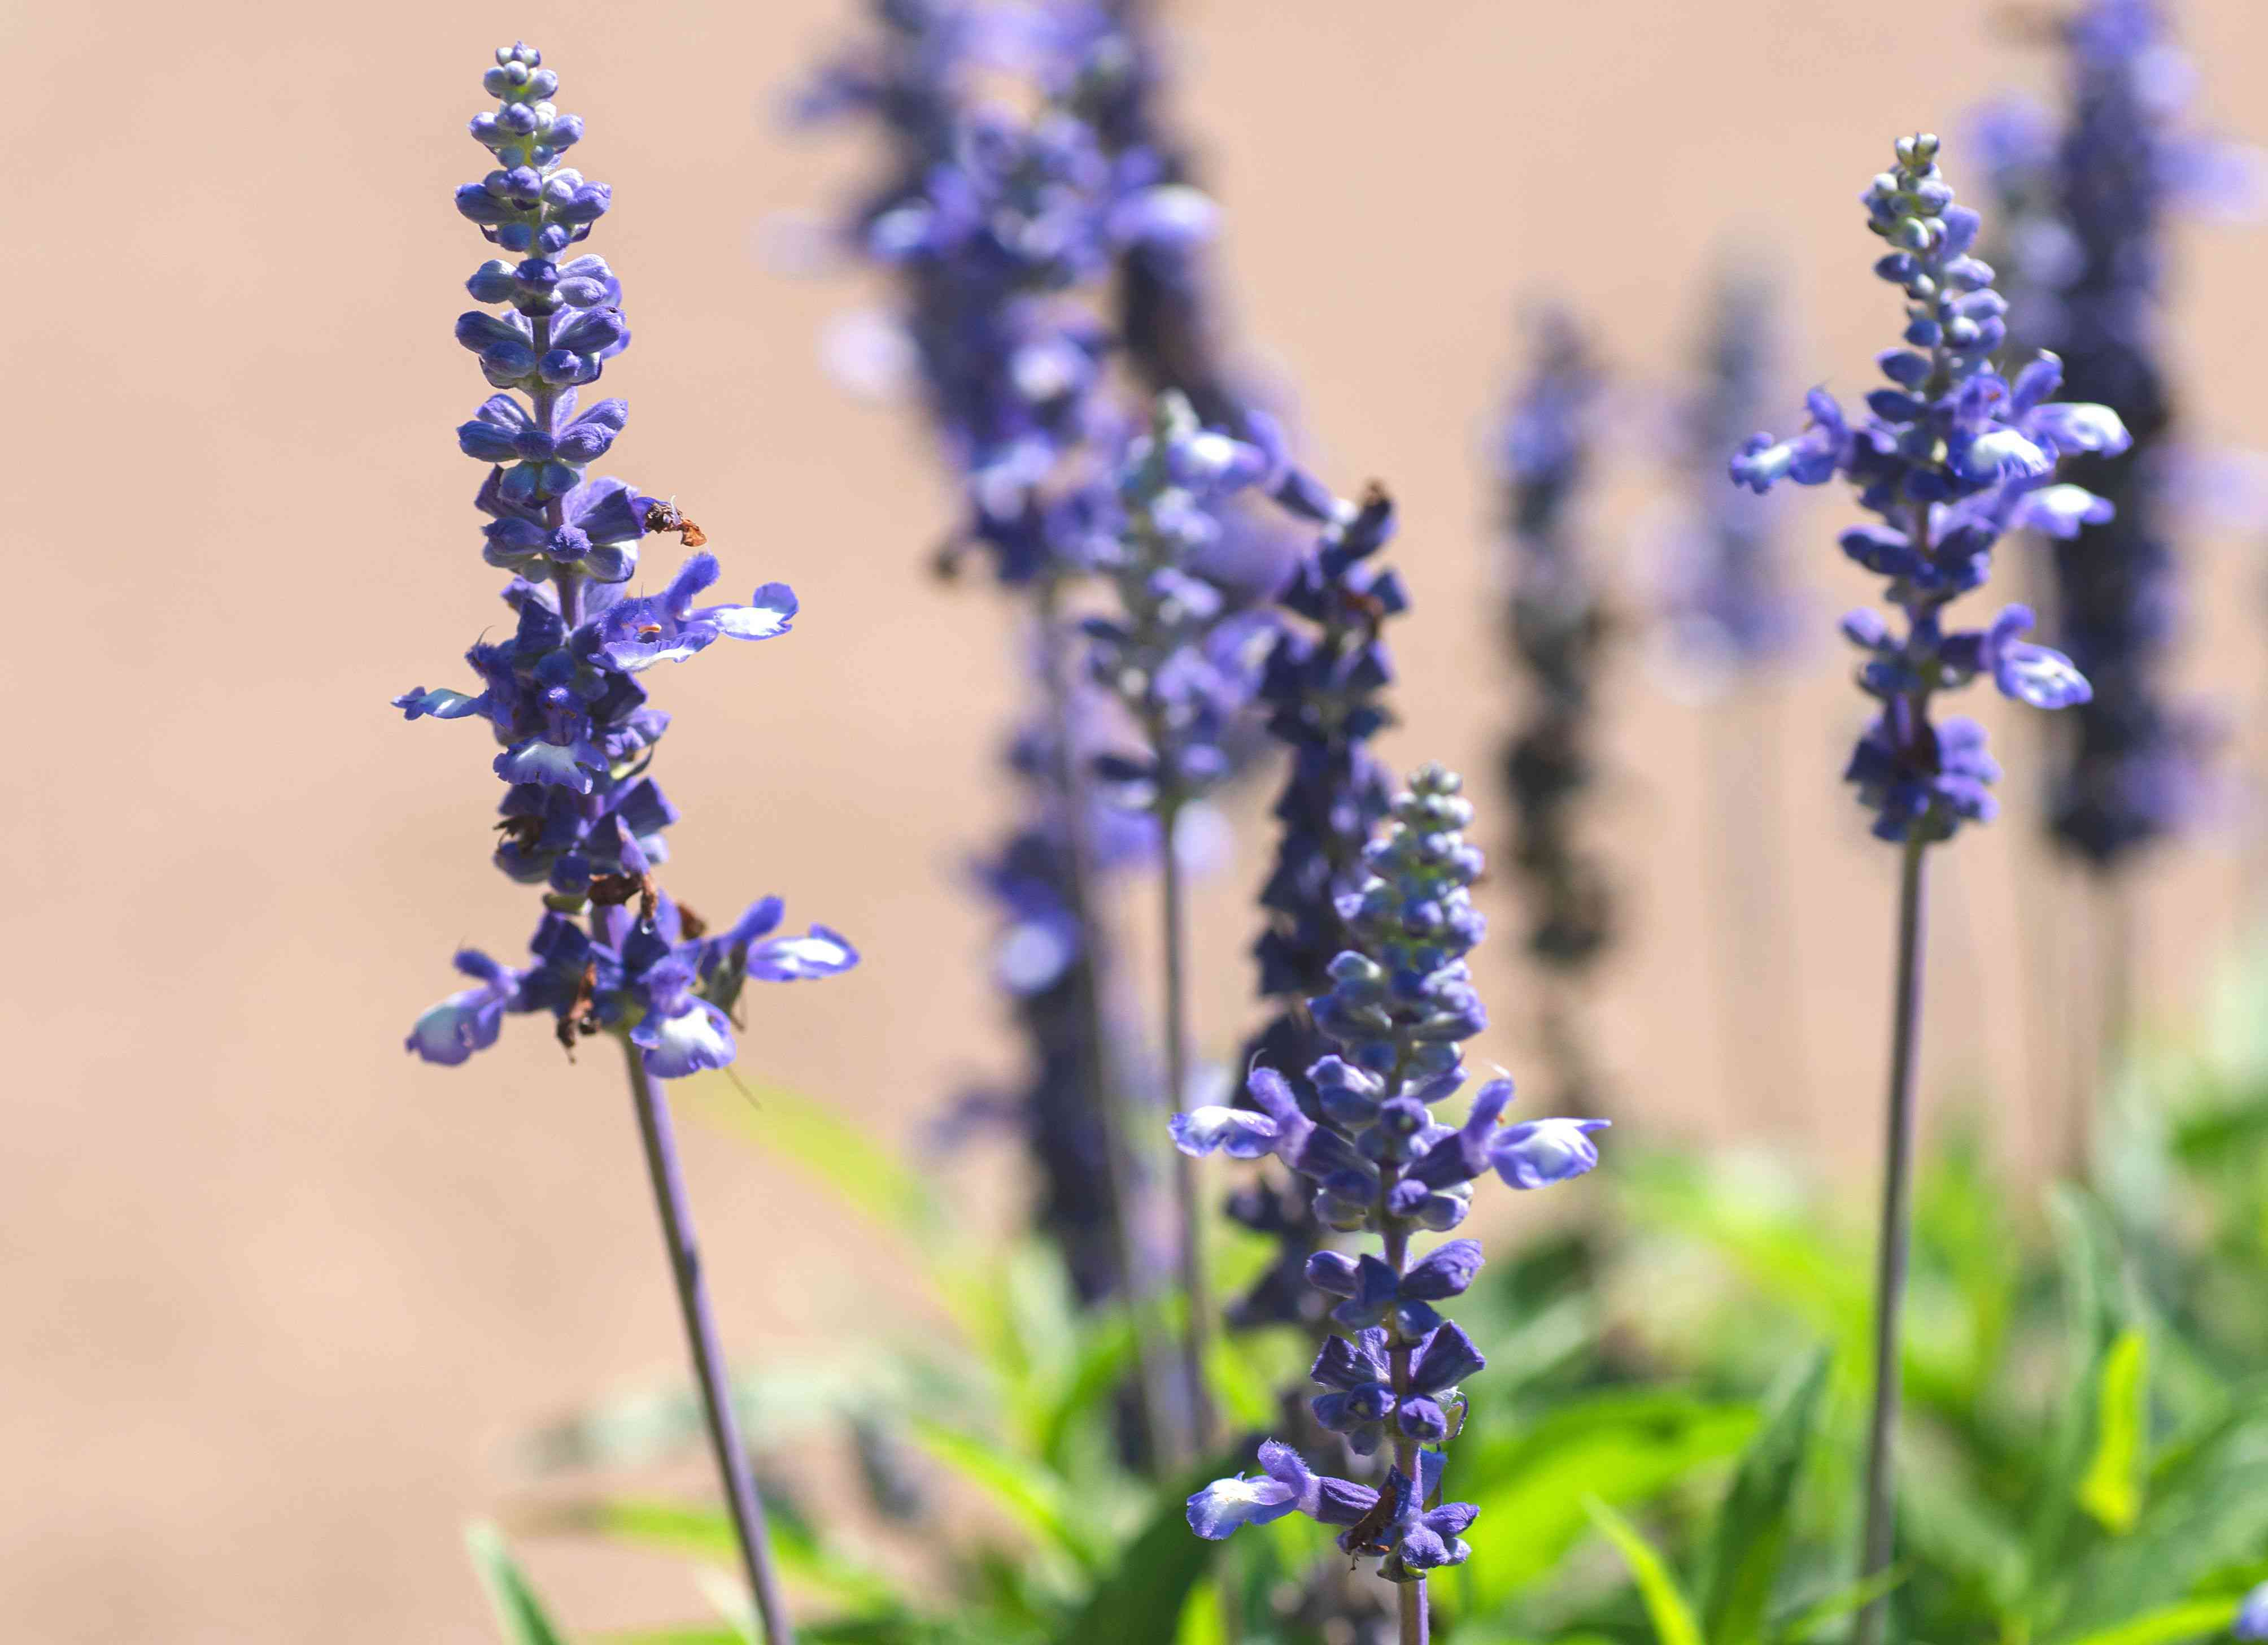 Victoria blue salvia with purple flowers on thin stems closeup